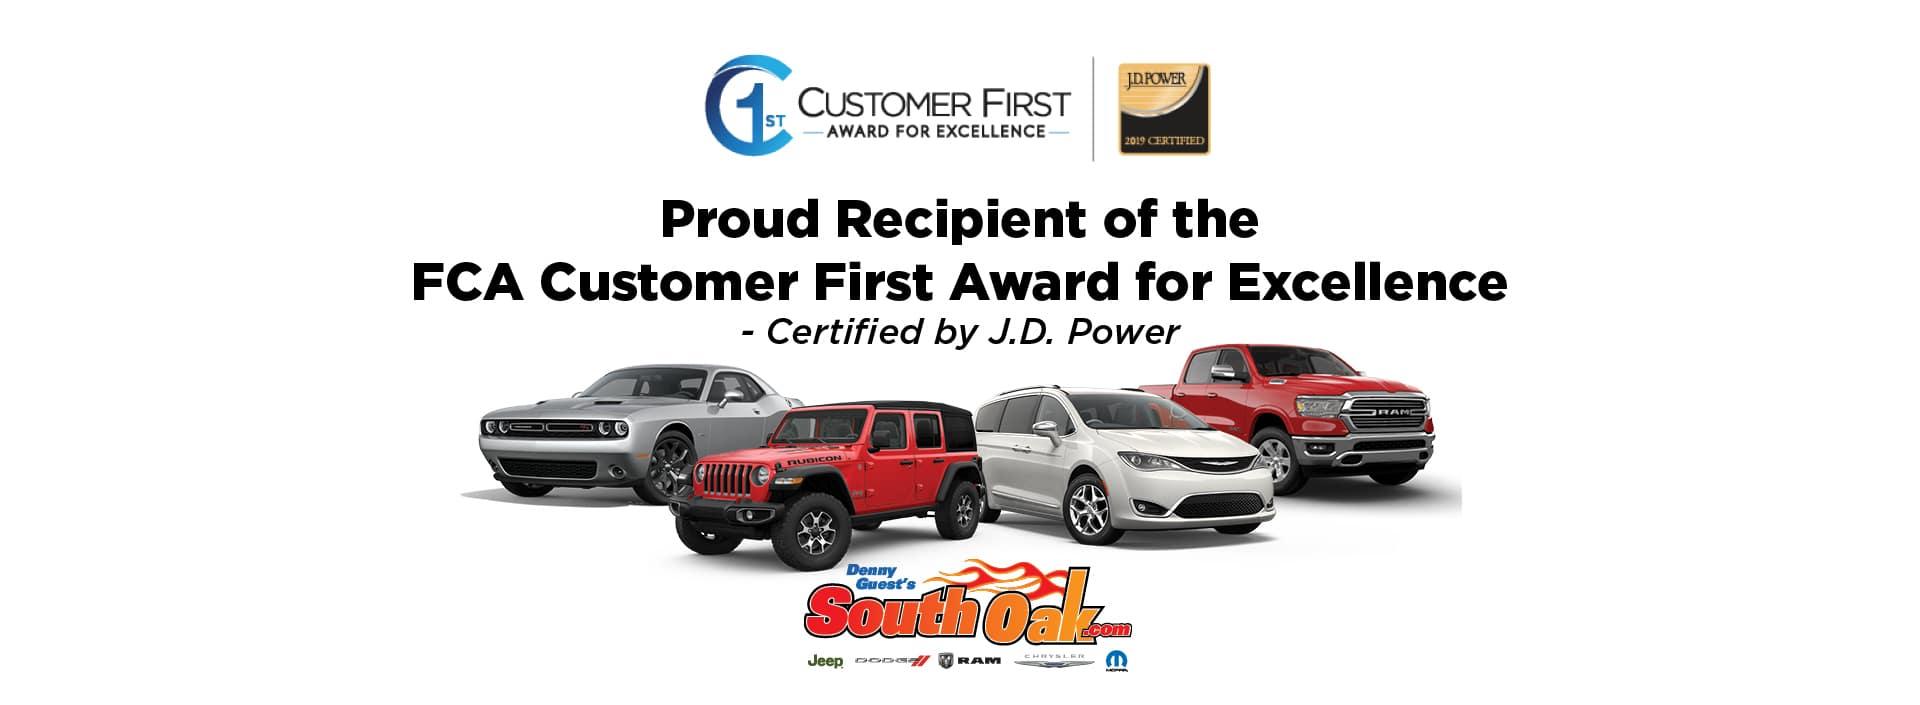 South Oak Jeep Dodge Chrysler Ram   CDJR Dealer in Matteson, IL